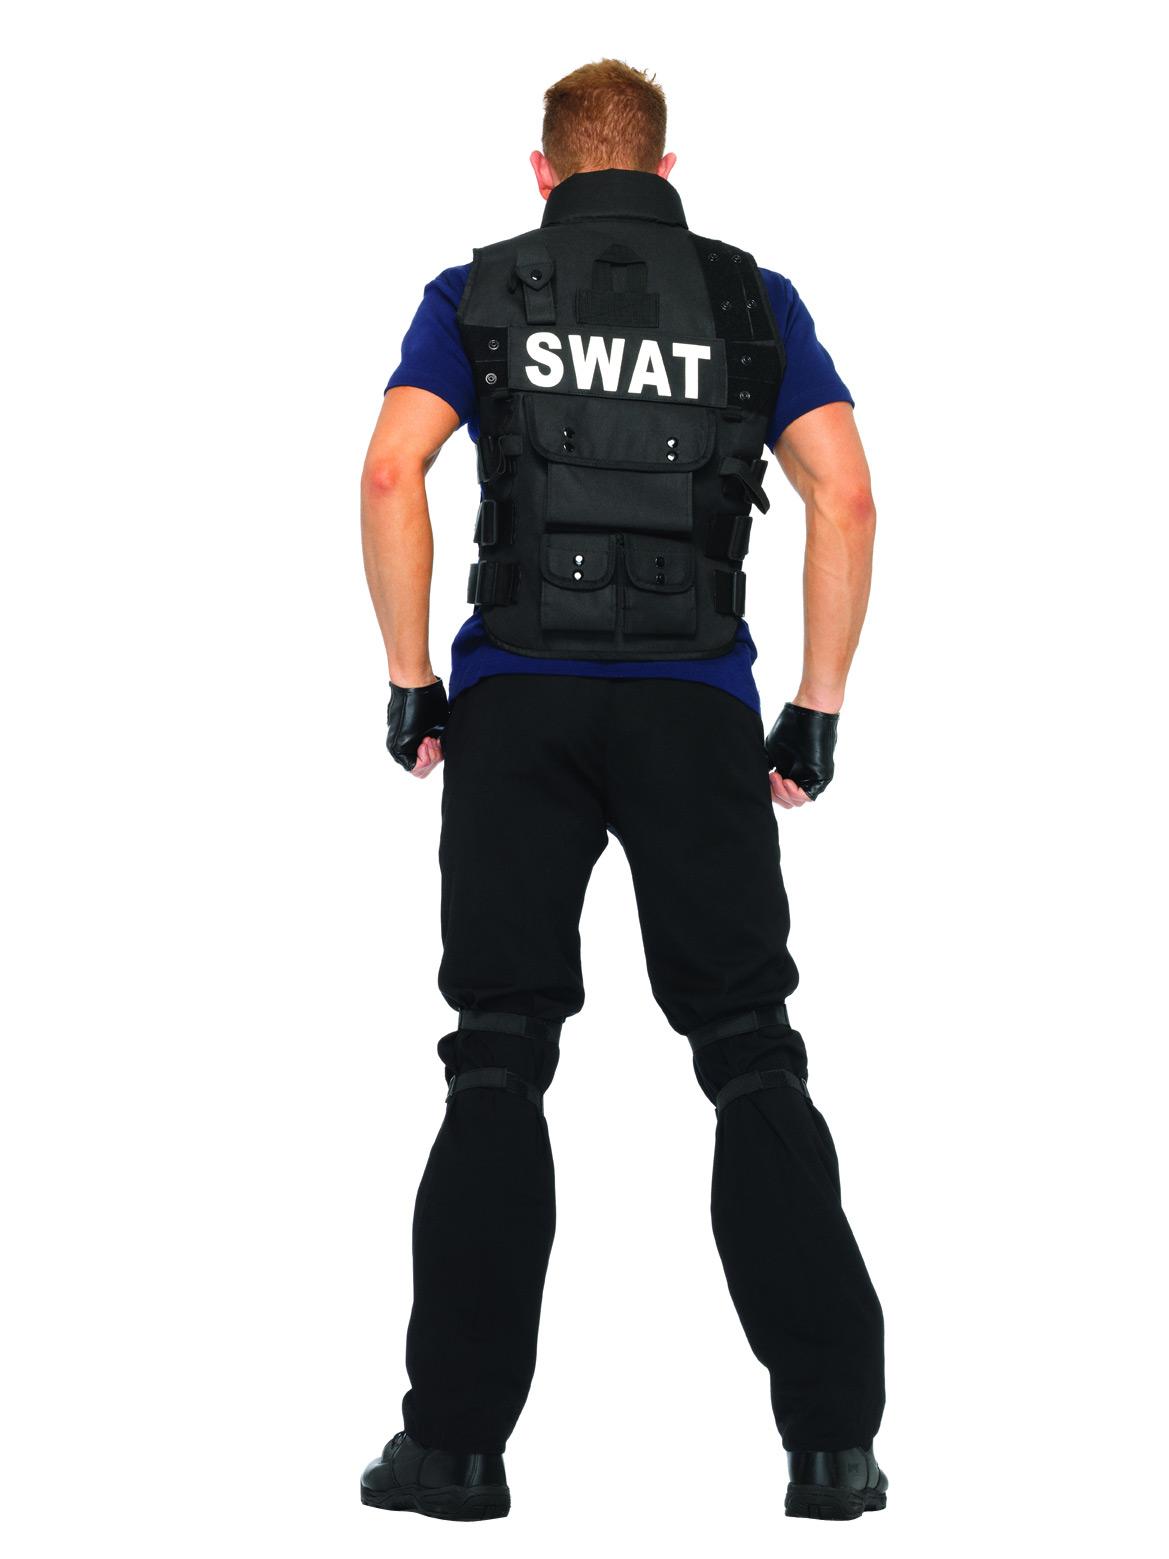 swat offizier kost m schwarz blau g nstige faschings kost me bei karneval megastore. Black Bedroom Furniture Sets. Home Design Ideas